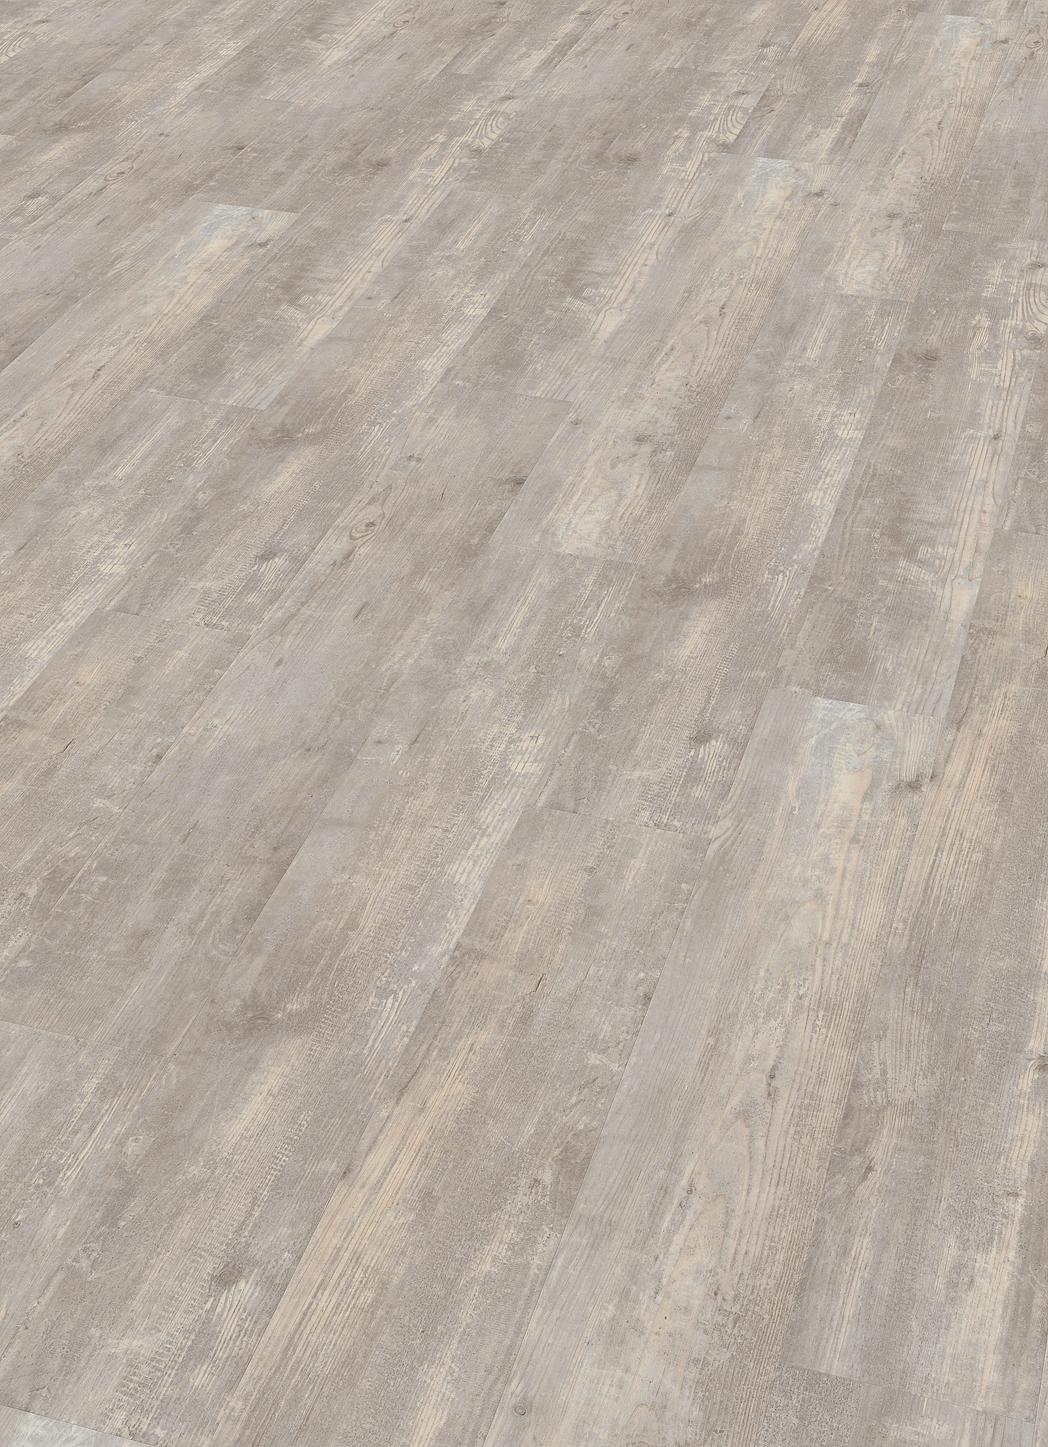 terh rne vinyl 9 mm klick pinie malm grau inkl trittschall i01 straight choice. Black Bedroom Furniture Sets. Home Design Ideas